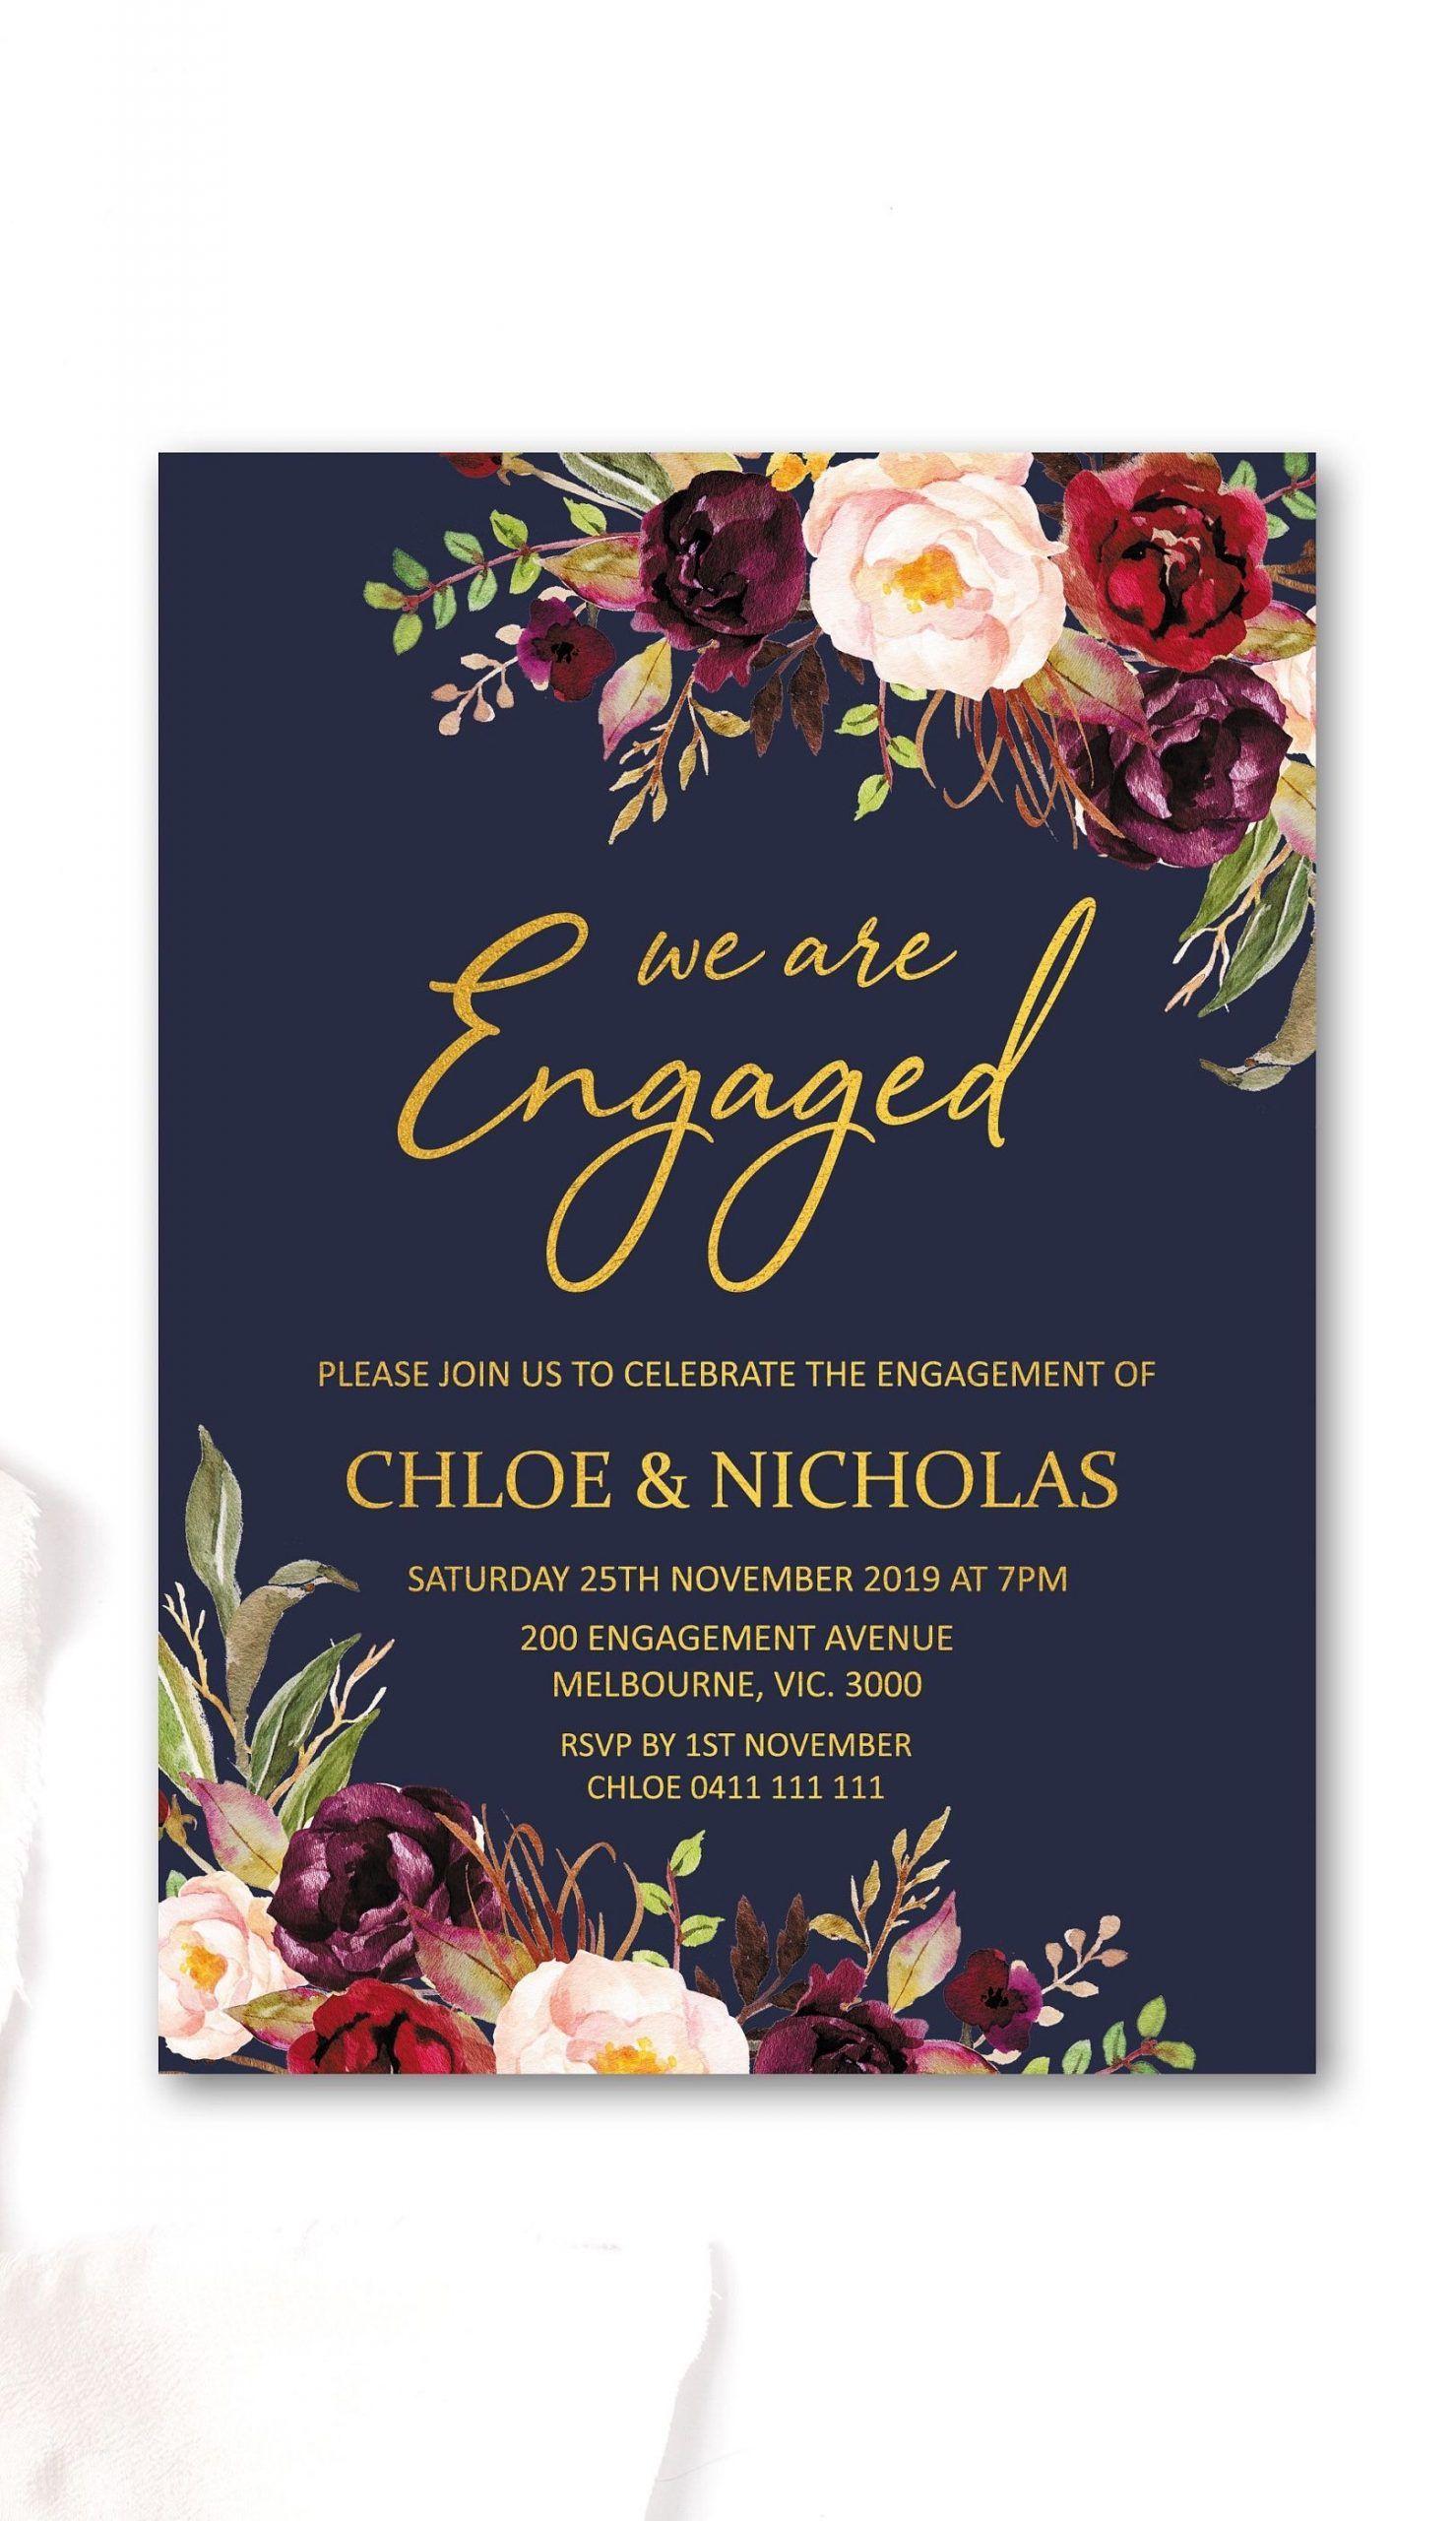 Date Night Invitation Template Engagement Party Invitations Engagement Invitation Cards Printable Engagement Party Invitations